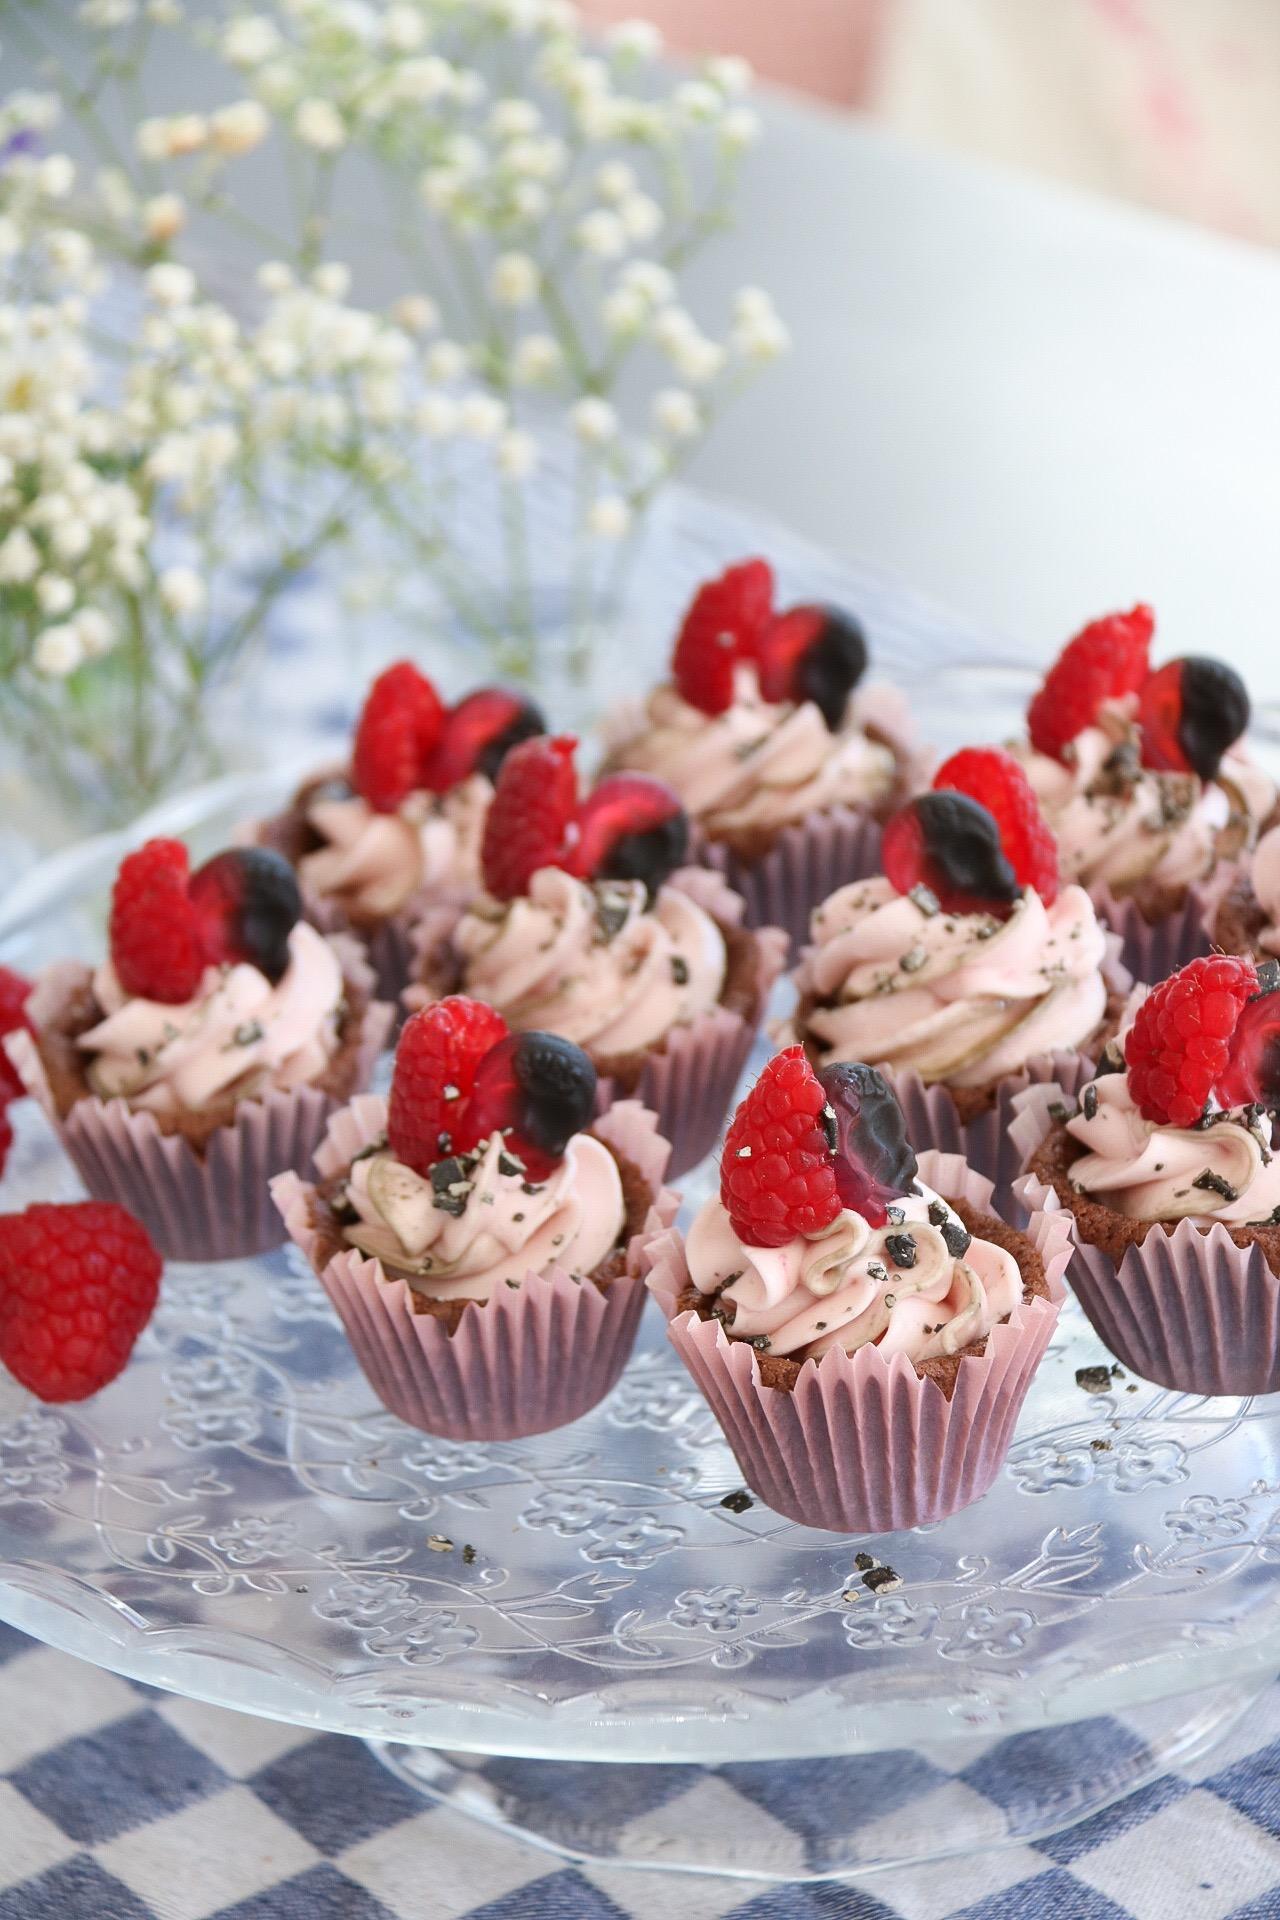 Hallonskalle cupcakes